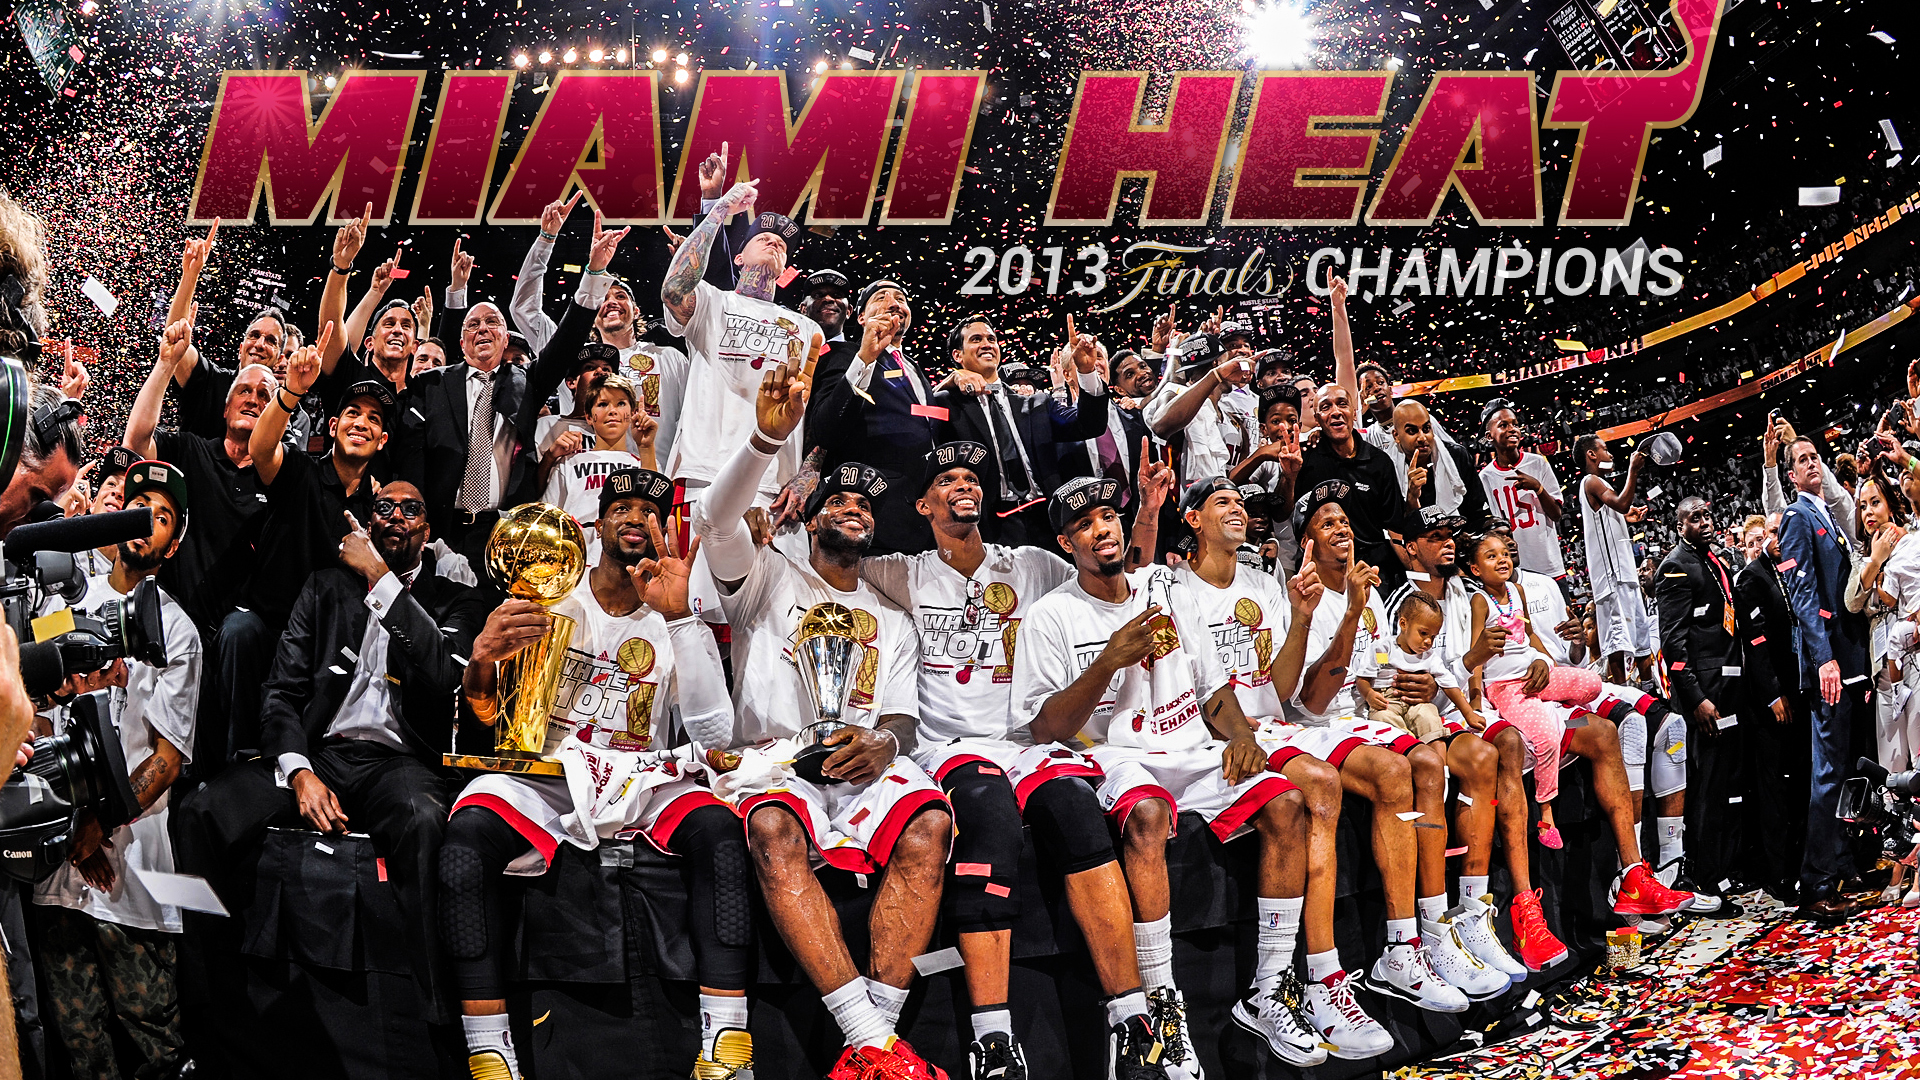 Miami Heat Wallpaper Iphone X Miami Heat Full Hd Wallpaper And Background Image